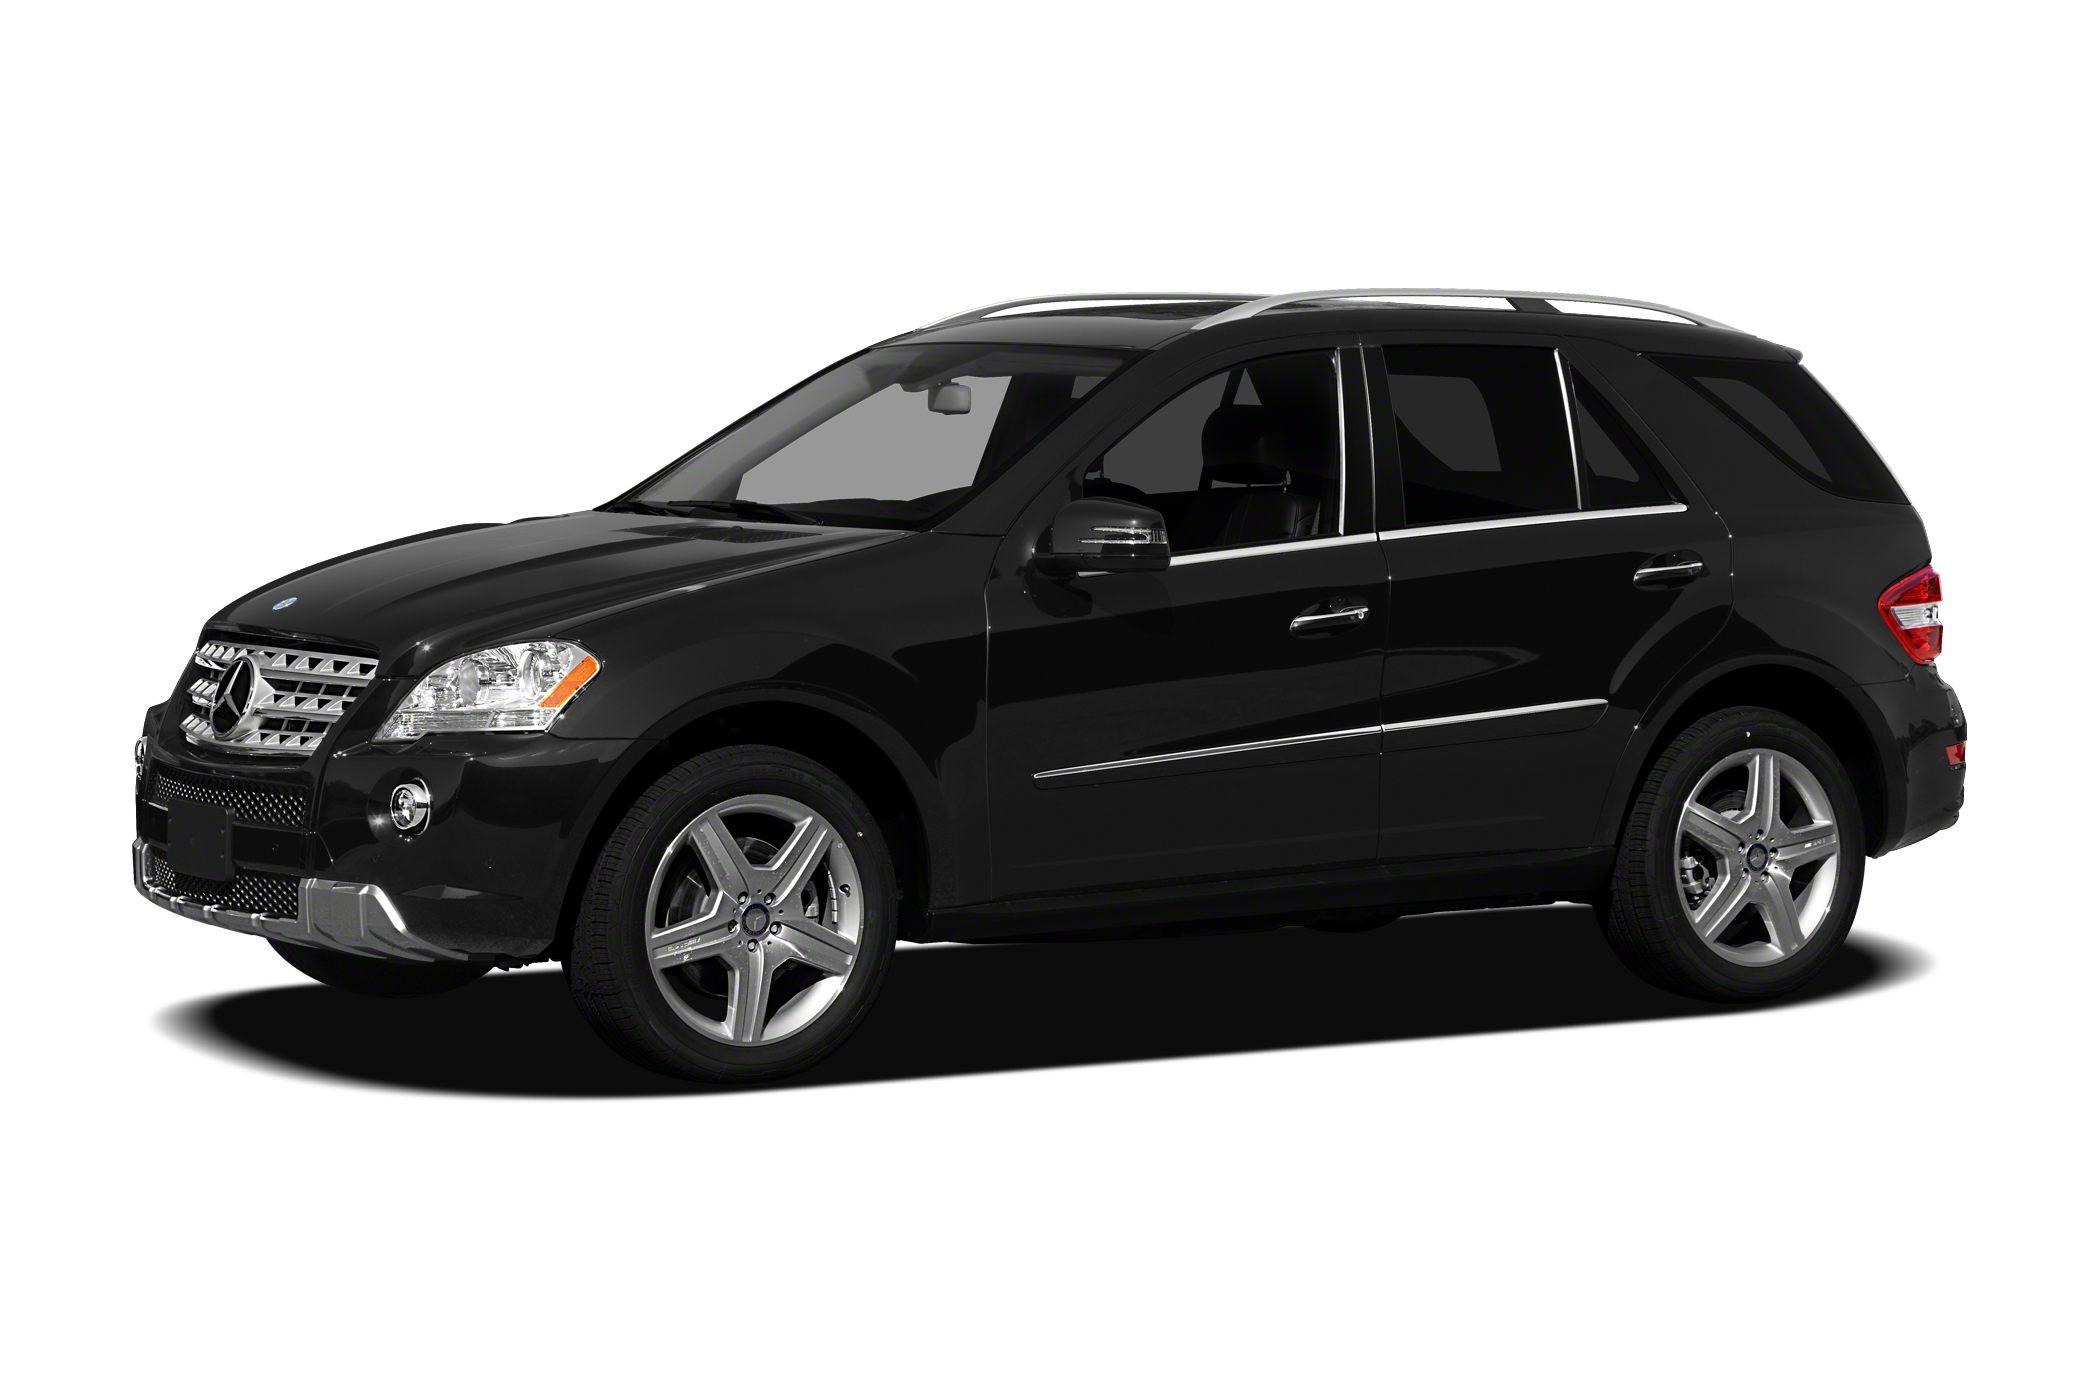 2011 Mercedes Benz M Class Base ML 550 4dr All wheel Drive 4MATIC